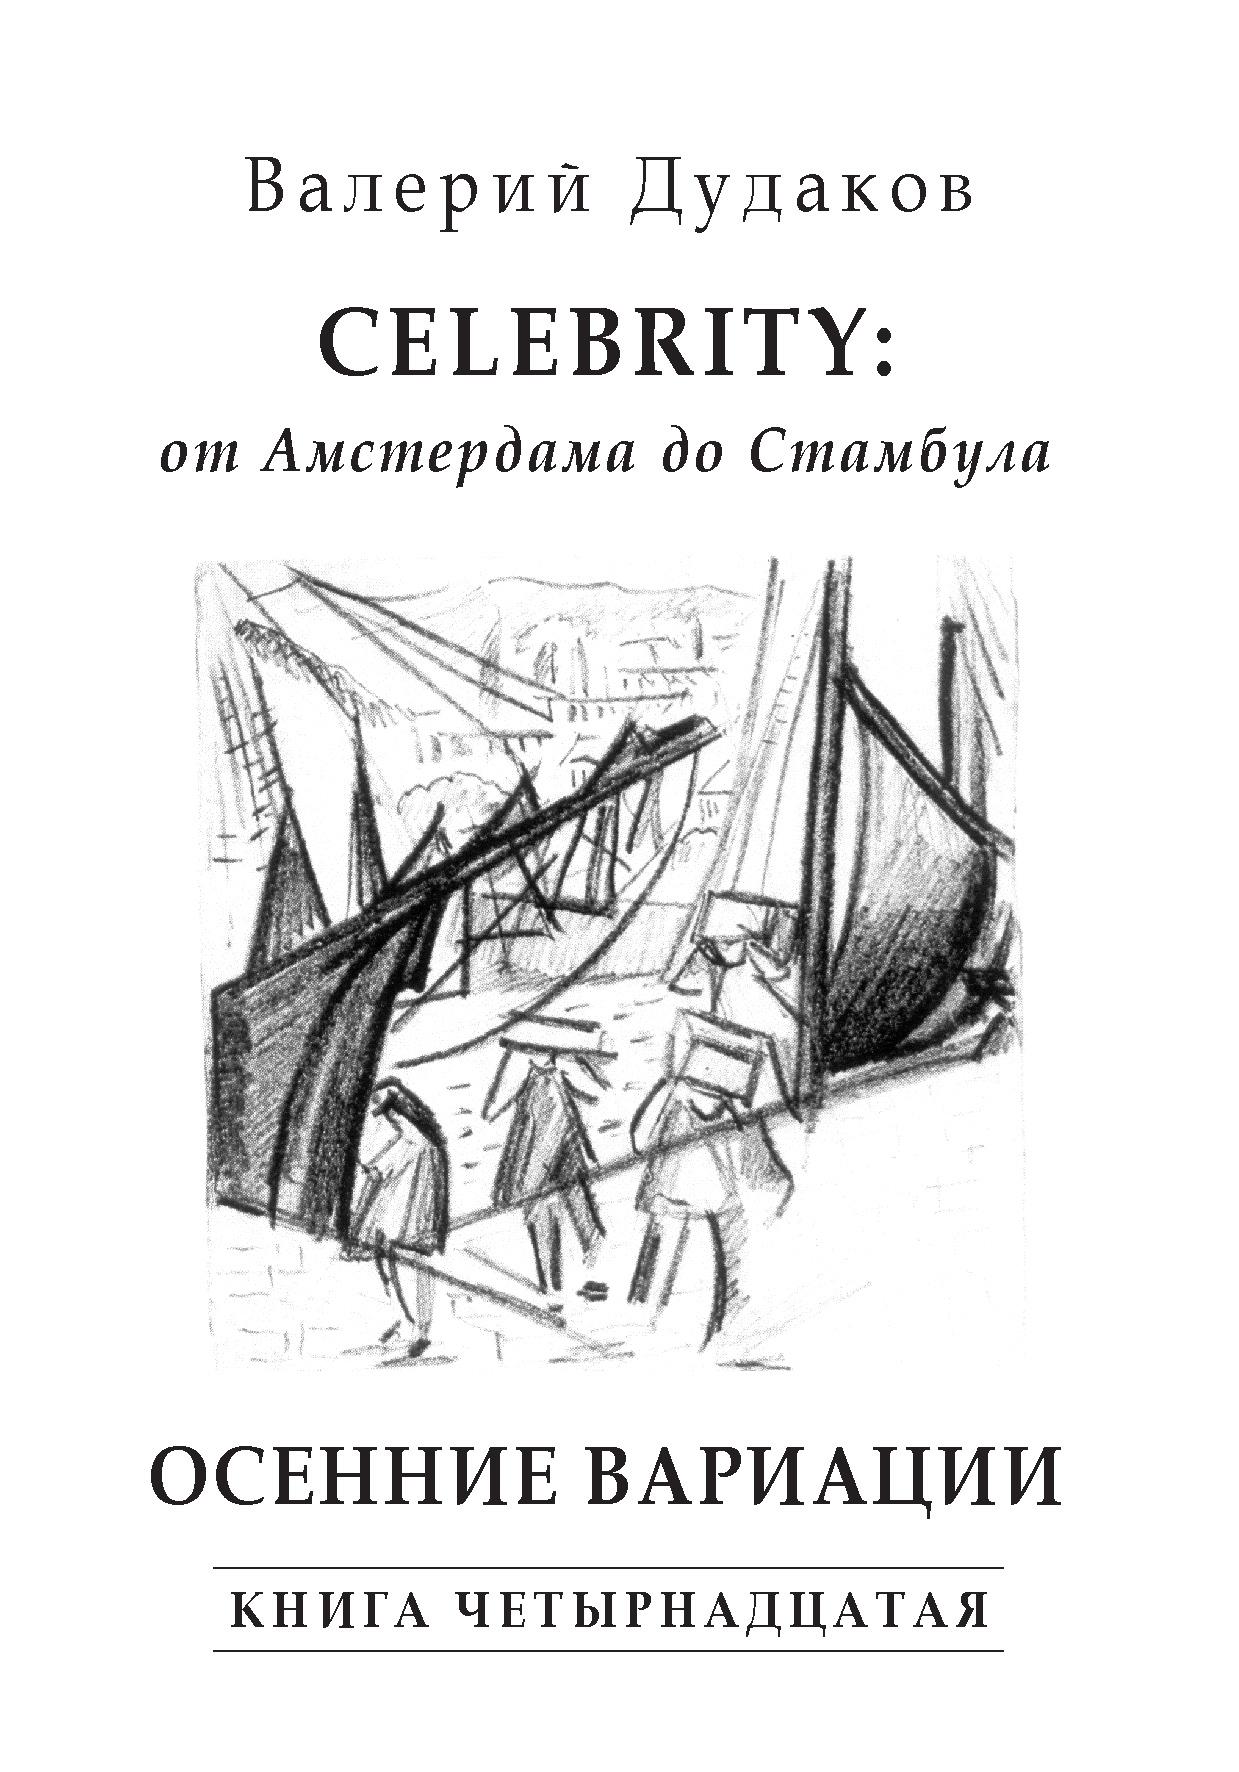 Валерий Дудаков Celebrity: от Амстердама до Стамбула. Осенние вариации